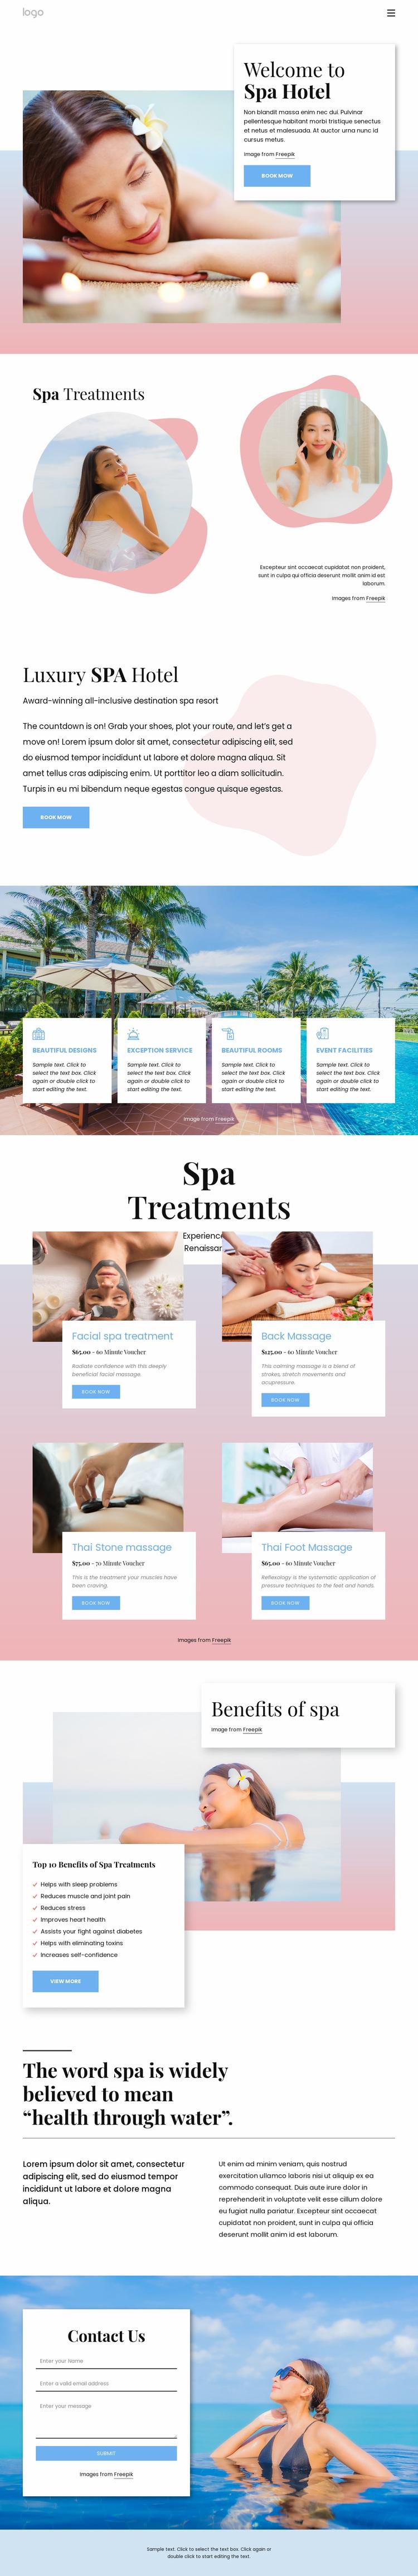 Spa boutique hotel Website Design